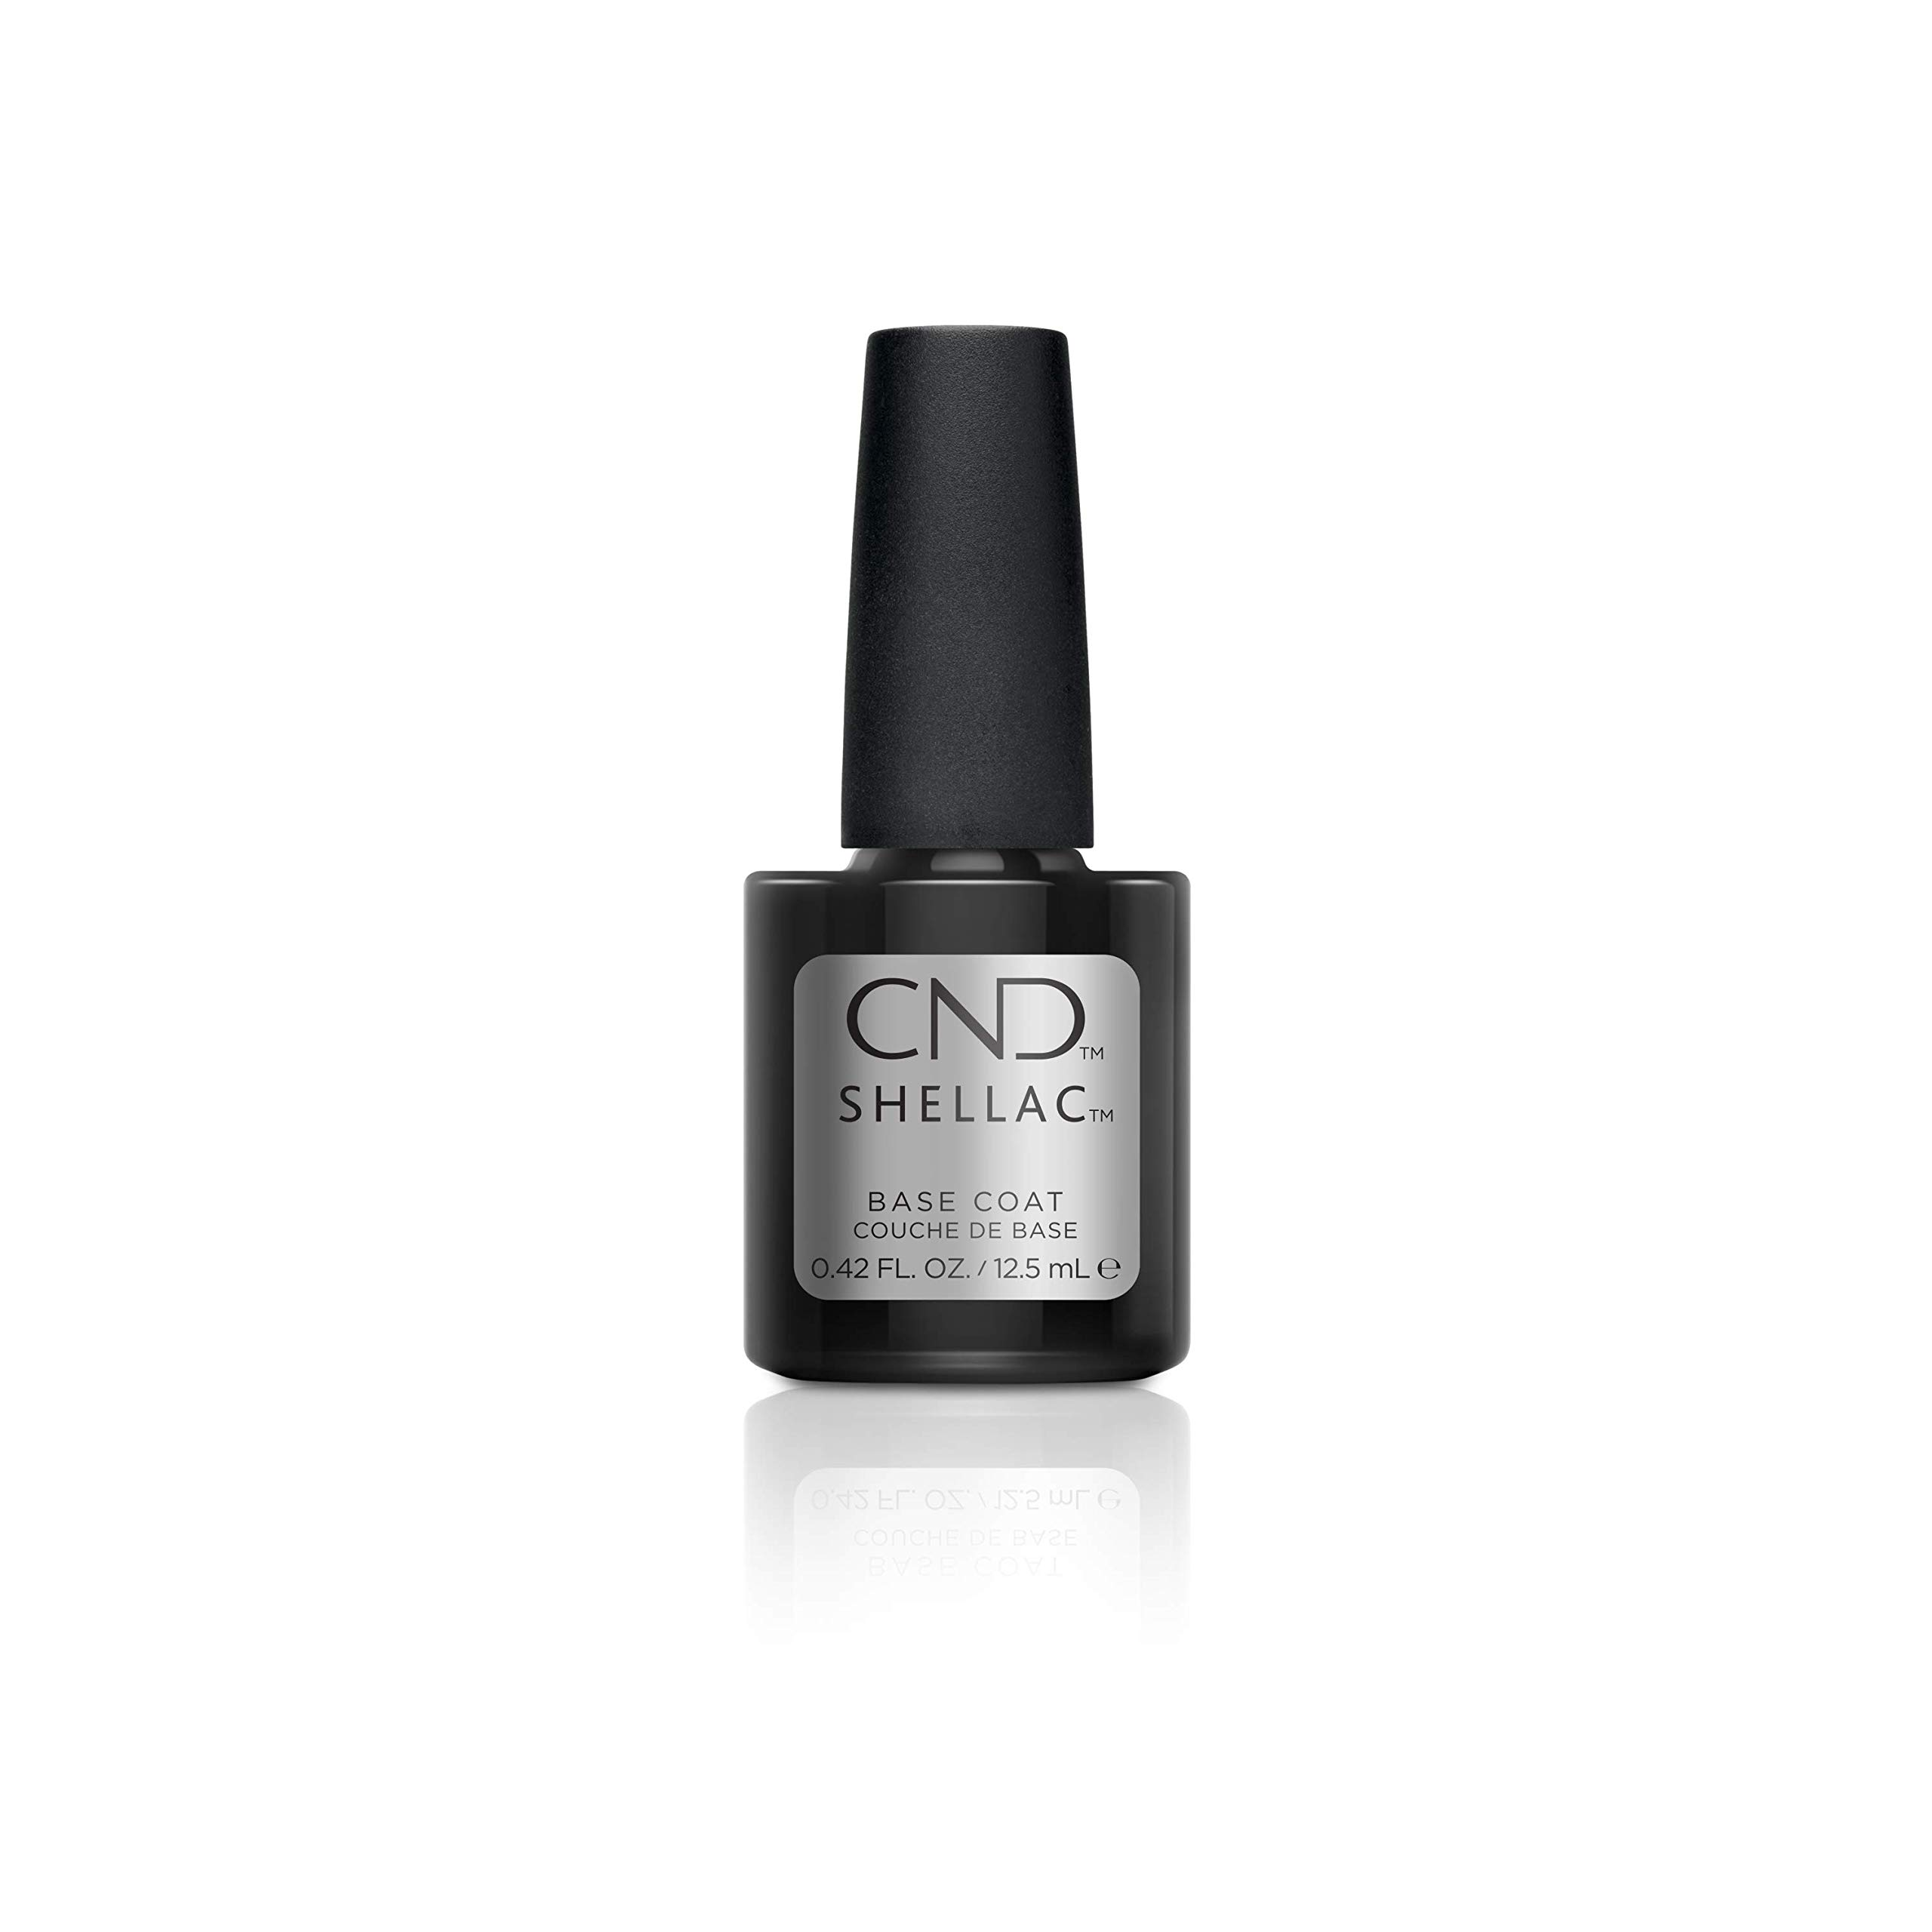 CND Shellac, Base Coat 12.5 ml